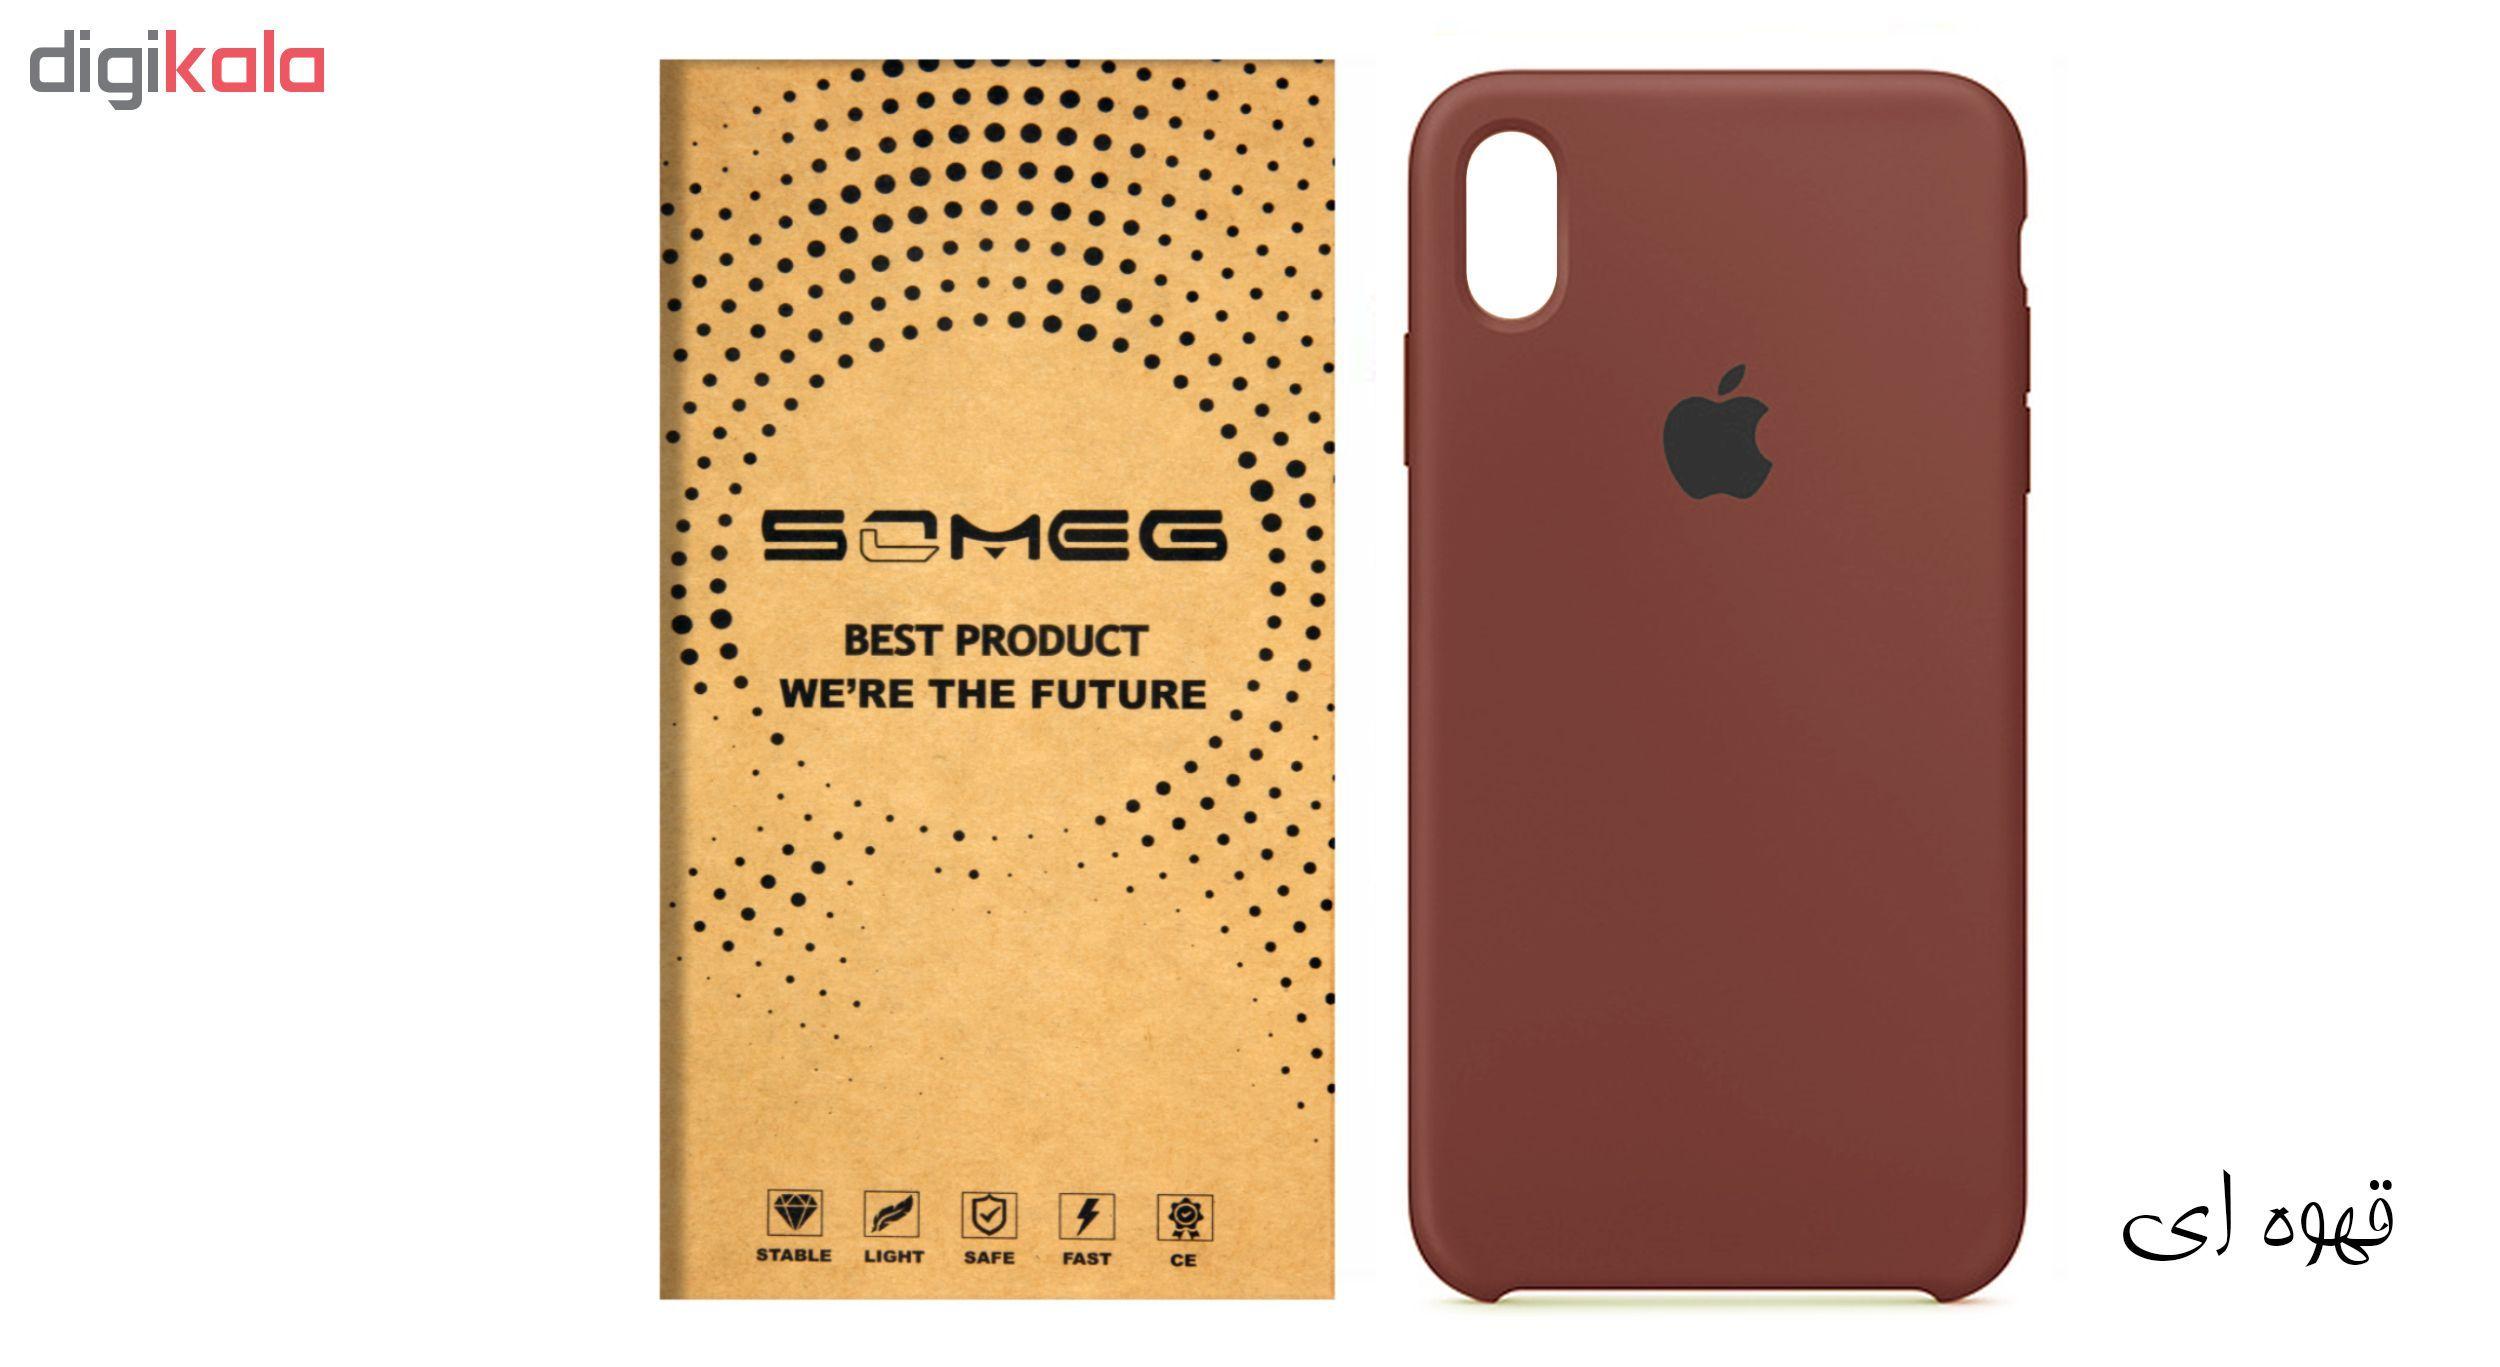 کاور سومگ مدل SIC مناسب برای گوشی موبایل اپل iPhone X  main 1 26